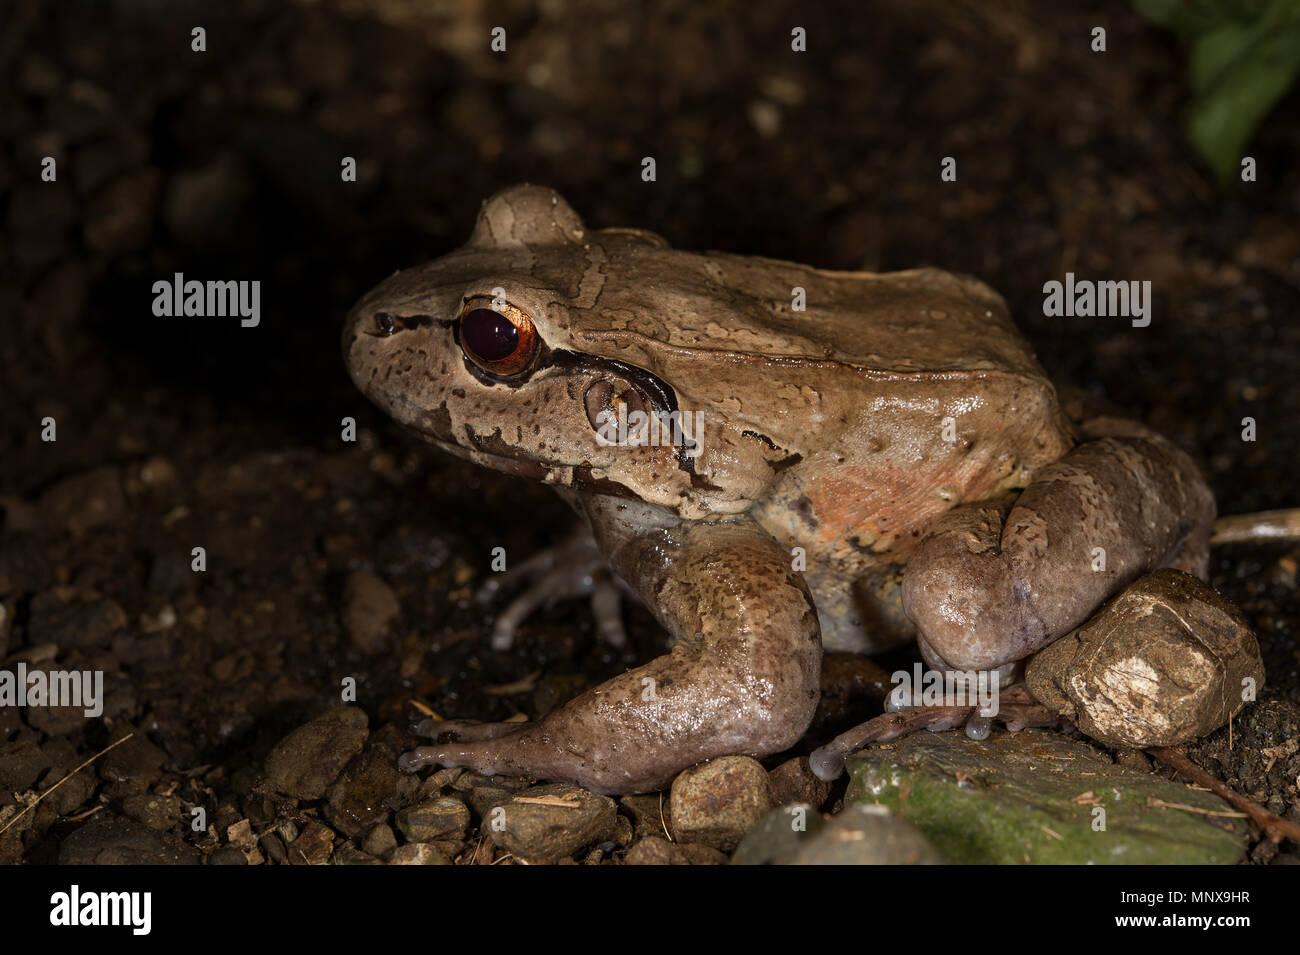 Atlantic Broad-headed Litter Frog, Craugastor megacephalus, Craugastoridae, Costa Rica - Stock Image